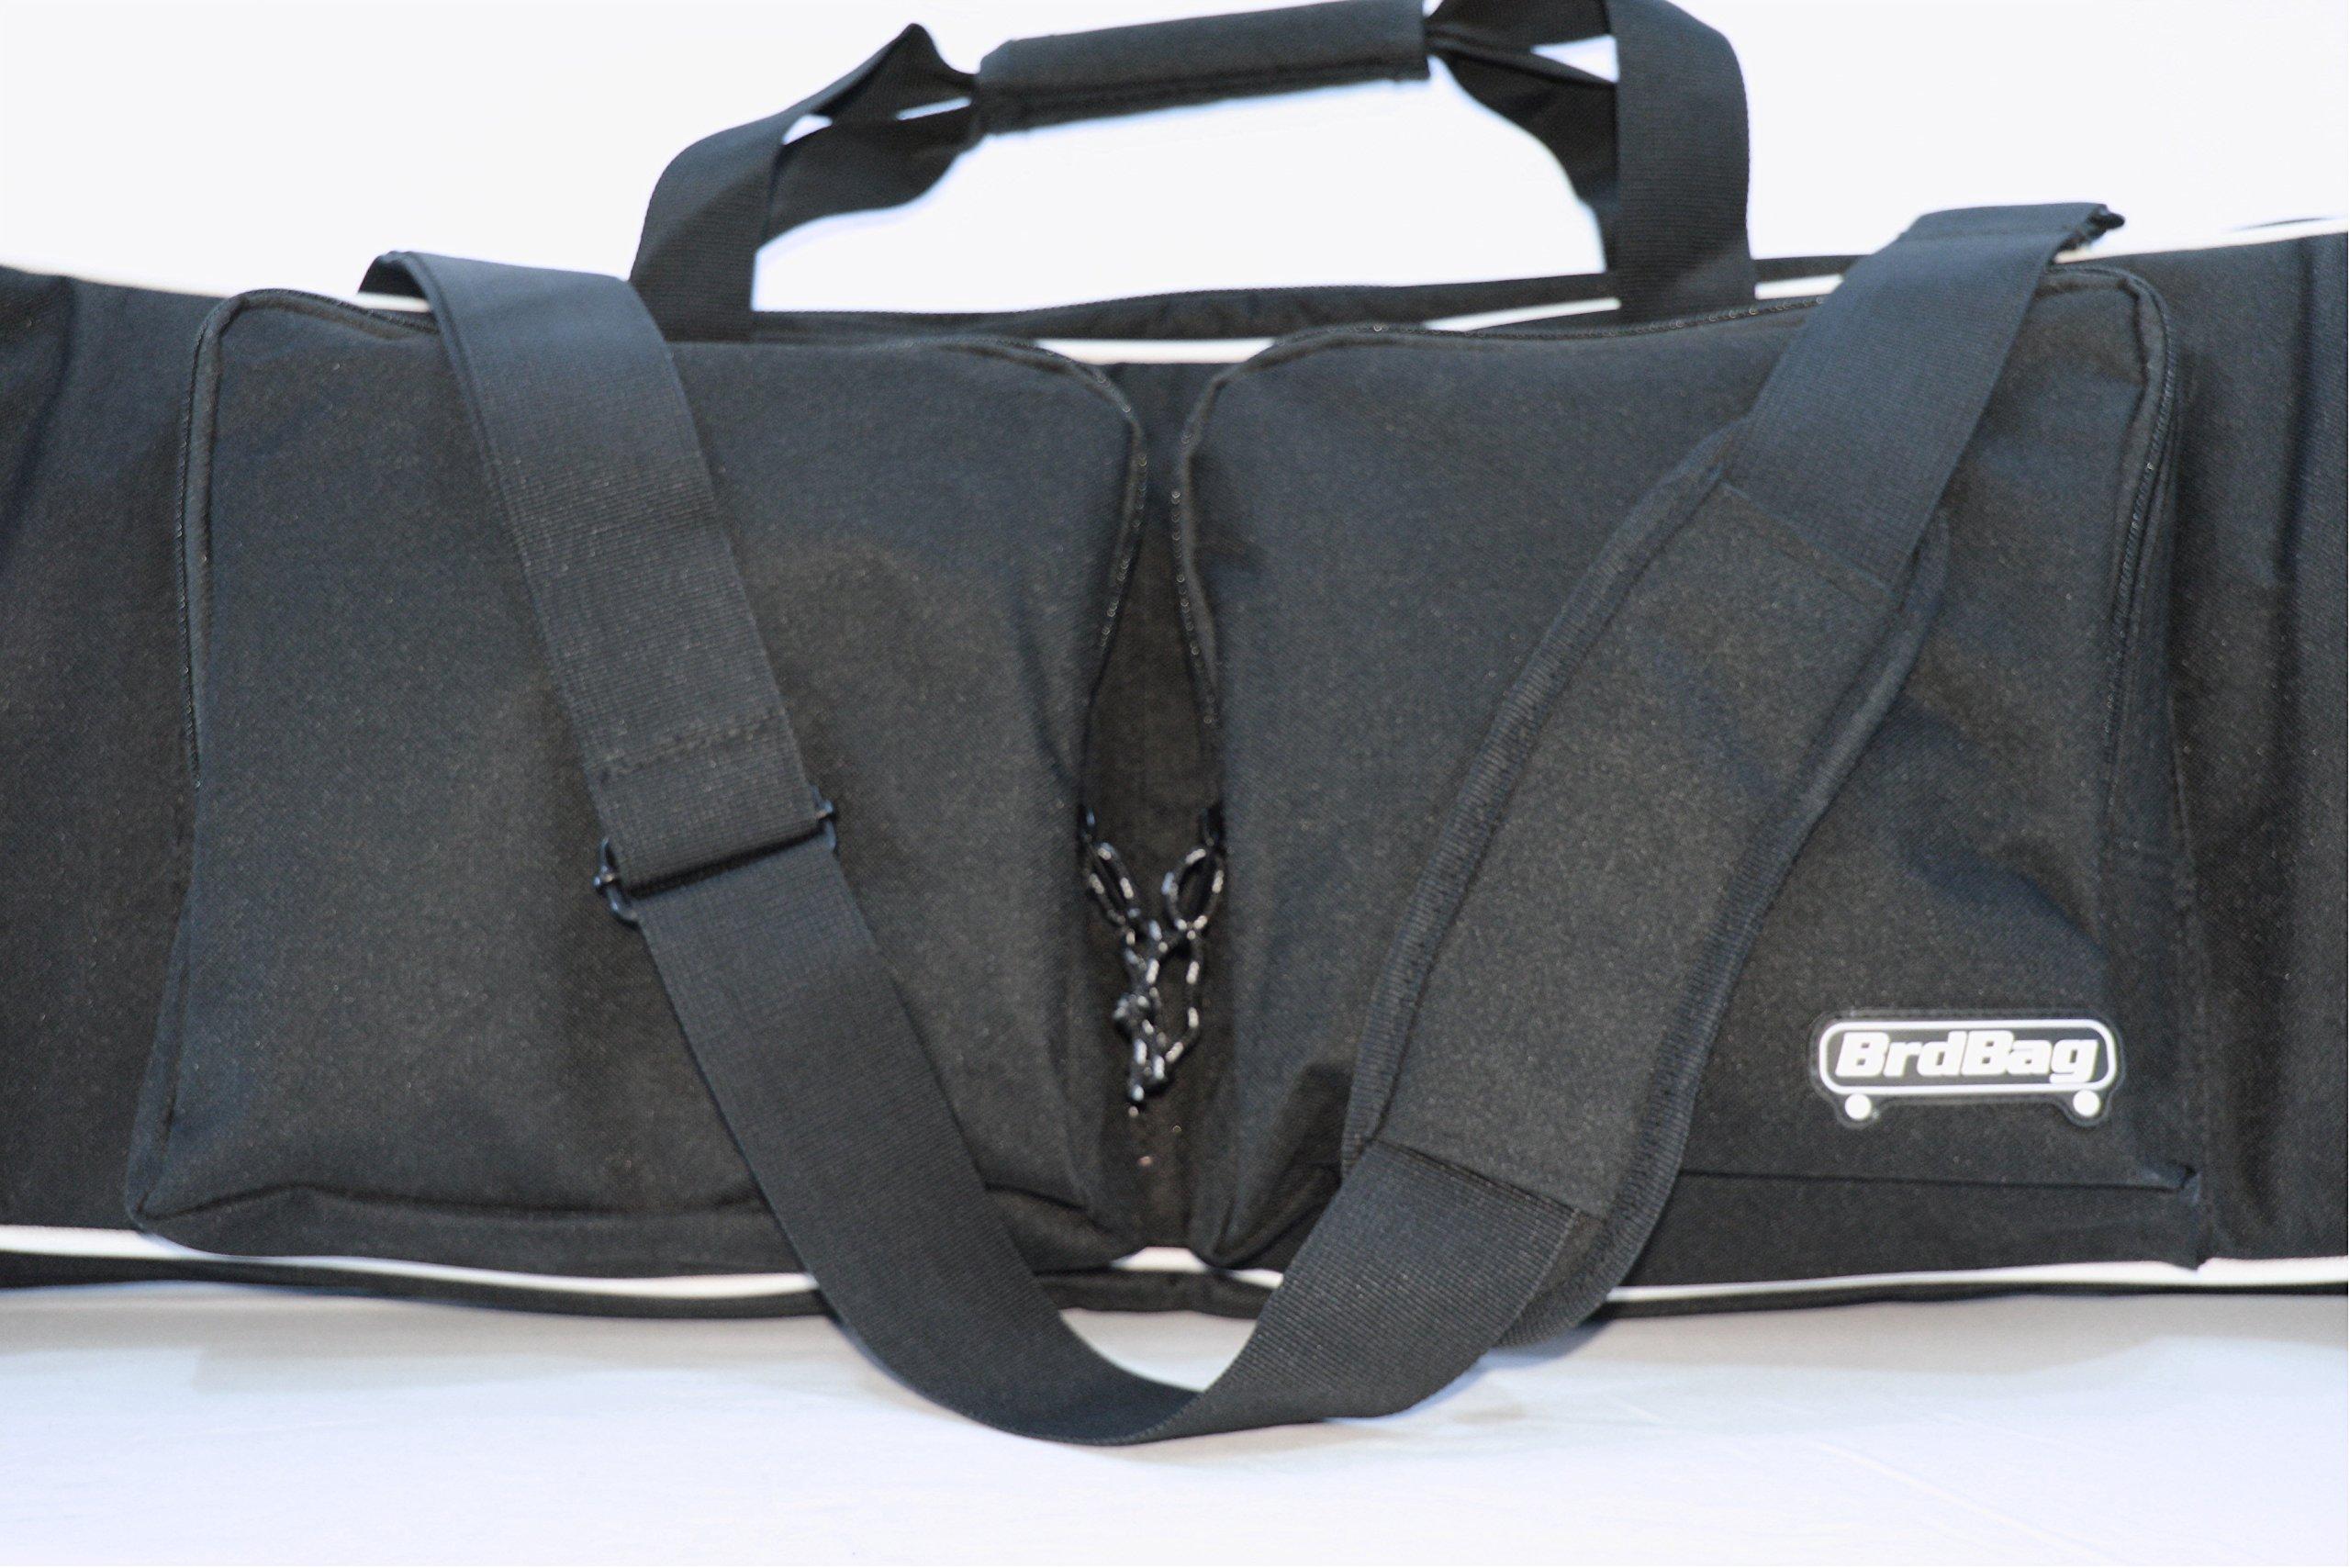 hubro designs brdbag boosted board bag with backpack straps padded